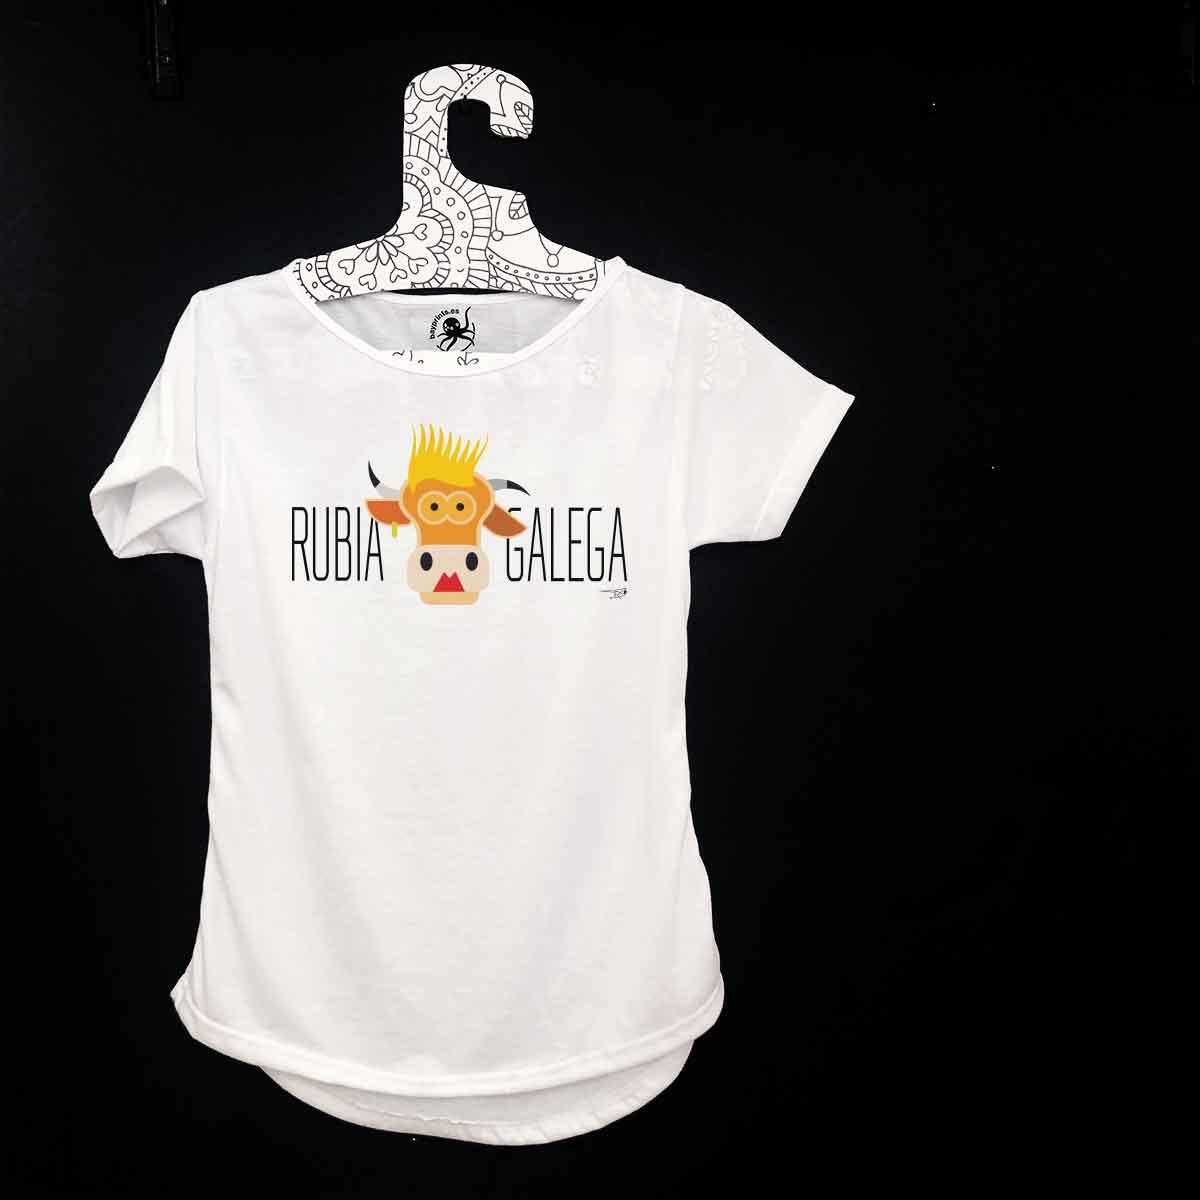 camiseta sudadera rubia galega rubia gallega camiseta online souvenirs originales singulares creativos baiona bayprints souvenir shop baiona souvenart shop camiseta galicia